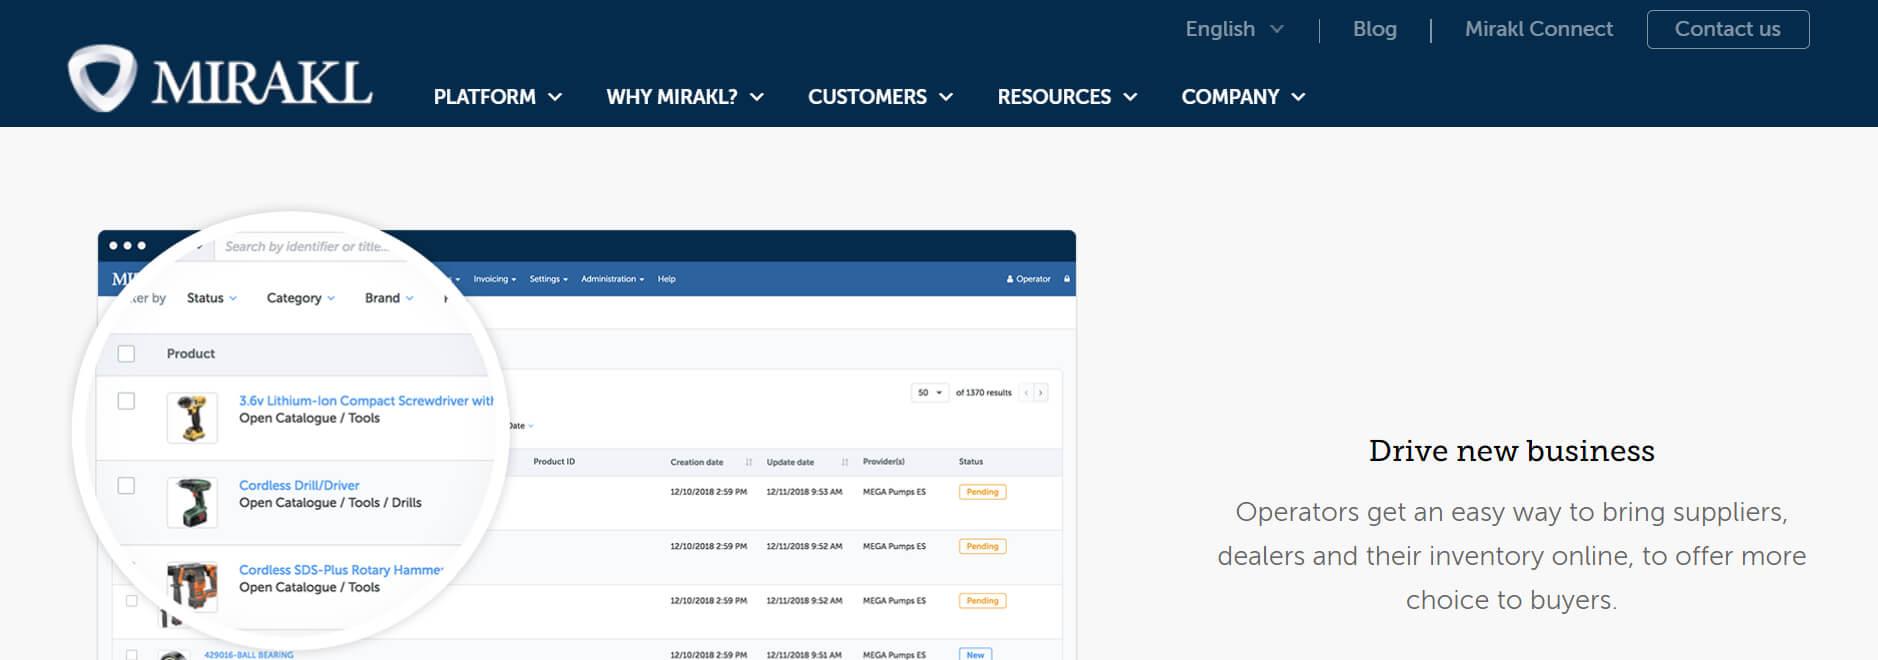 Mirakl: B2B and B2C marketplace solutions